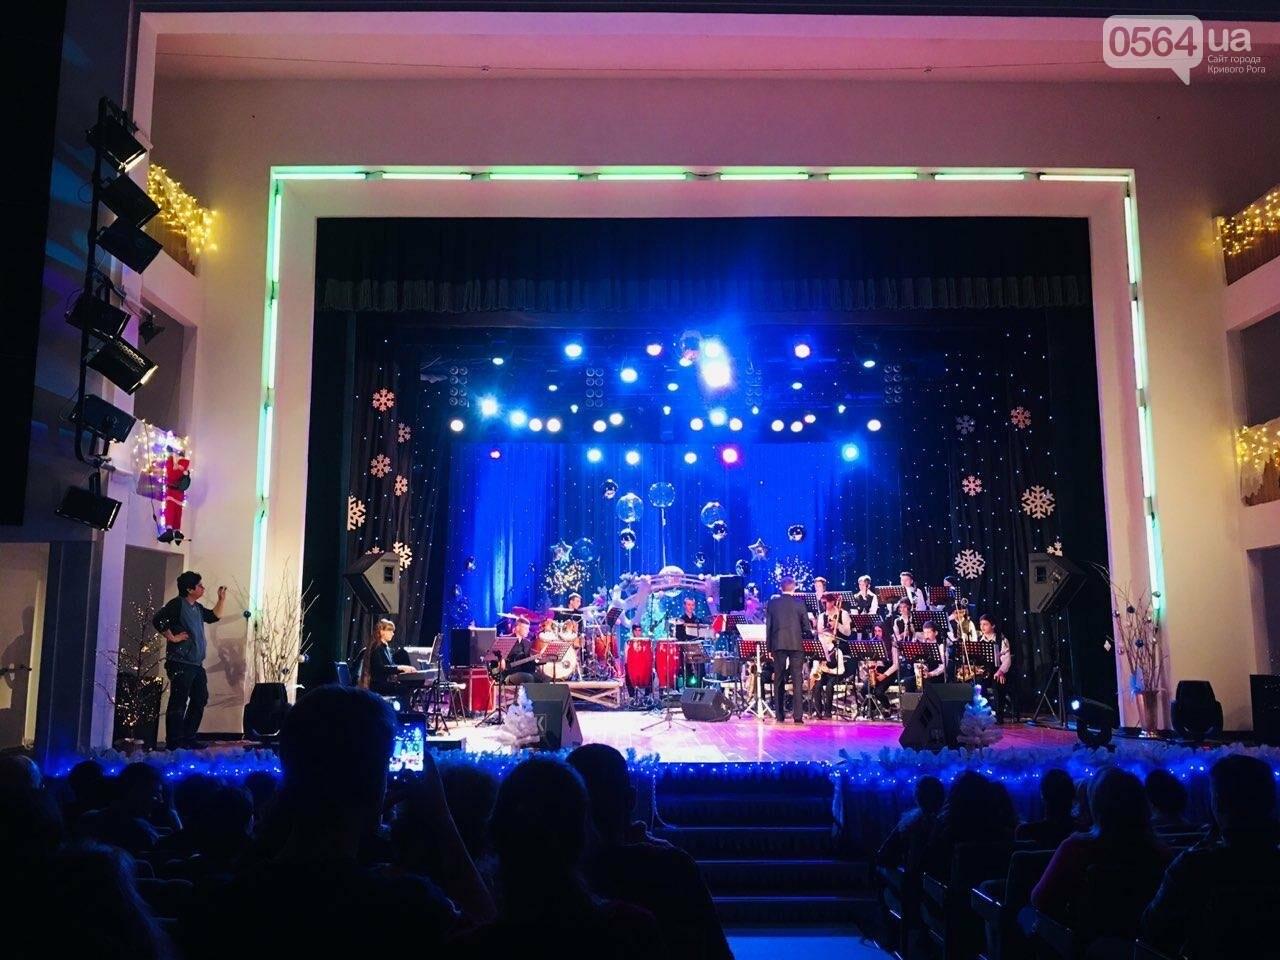 """Let it Snow"": на первое Рождество в Кривом Роге играют джаз, - ФОТО, ВИДЕО, фото-1"